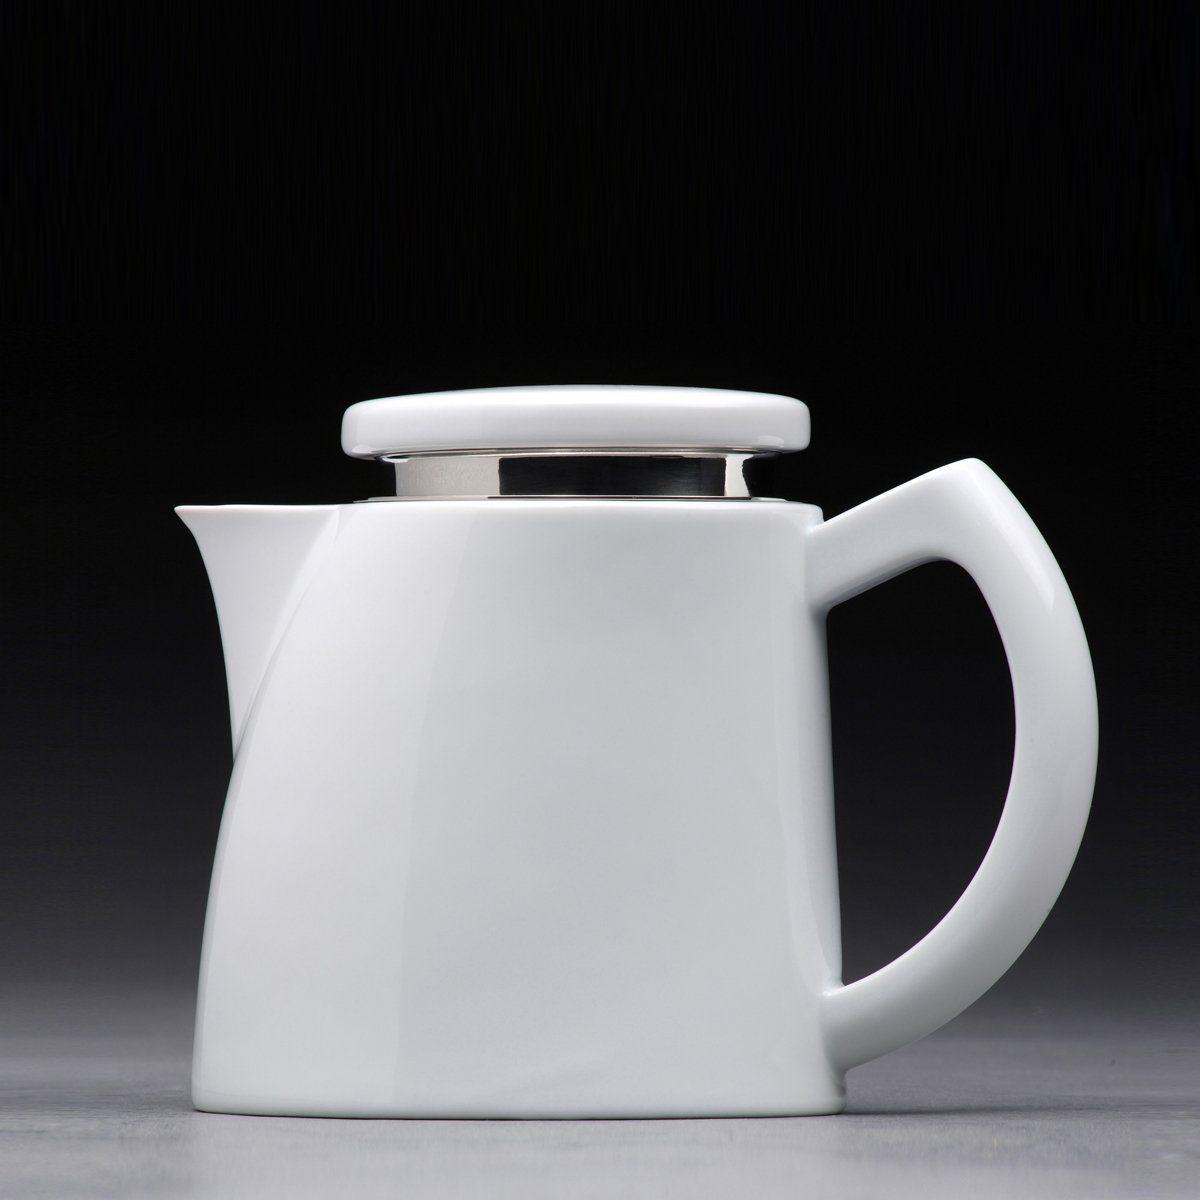 Sowden Sowden SoftBrew Kaffeekanne OSKAR 0.8L